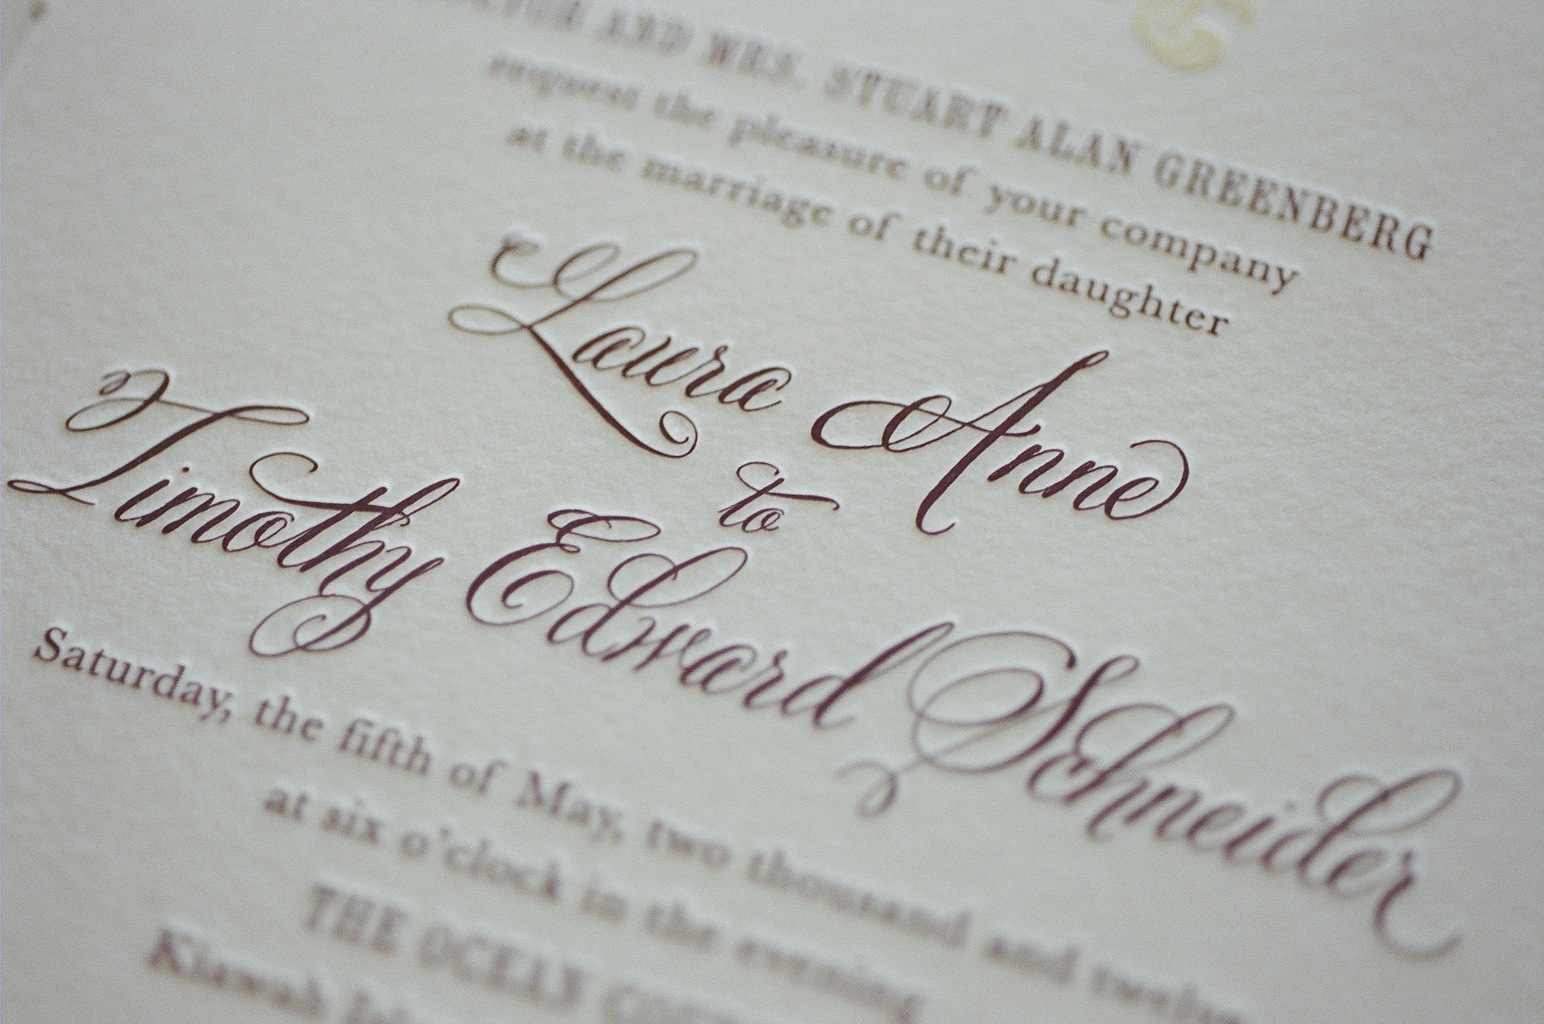 Good Wedding Invitation Fonts: 9 Elegant Fonts For Wedding Invitations Images